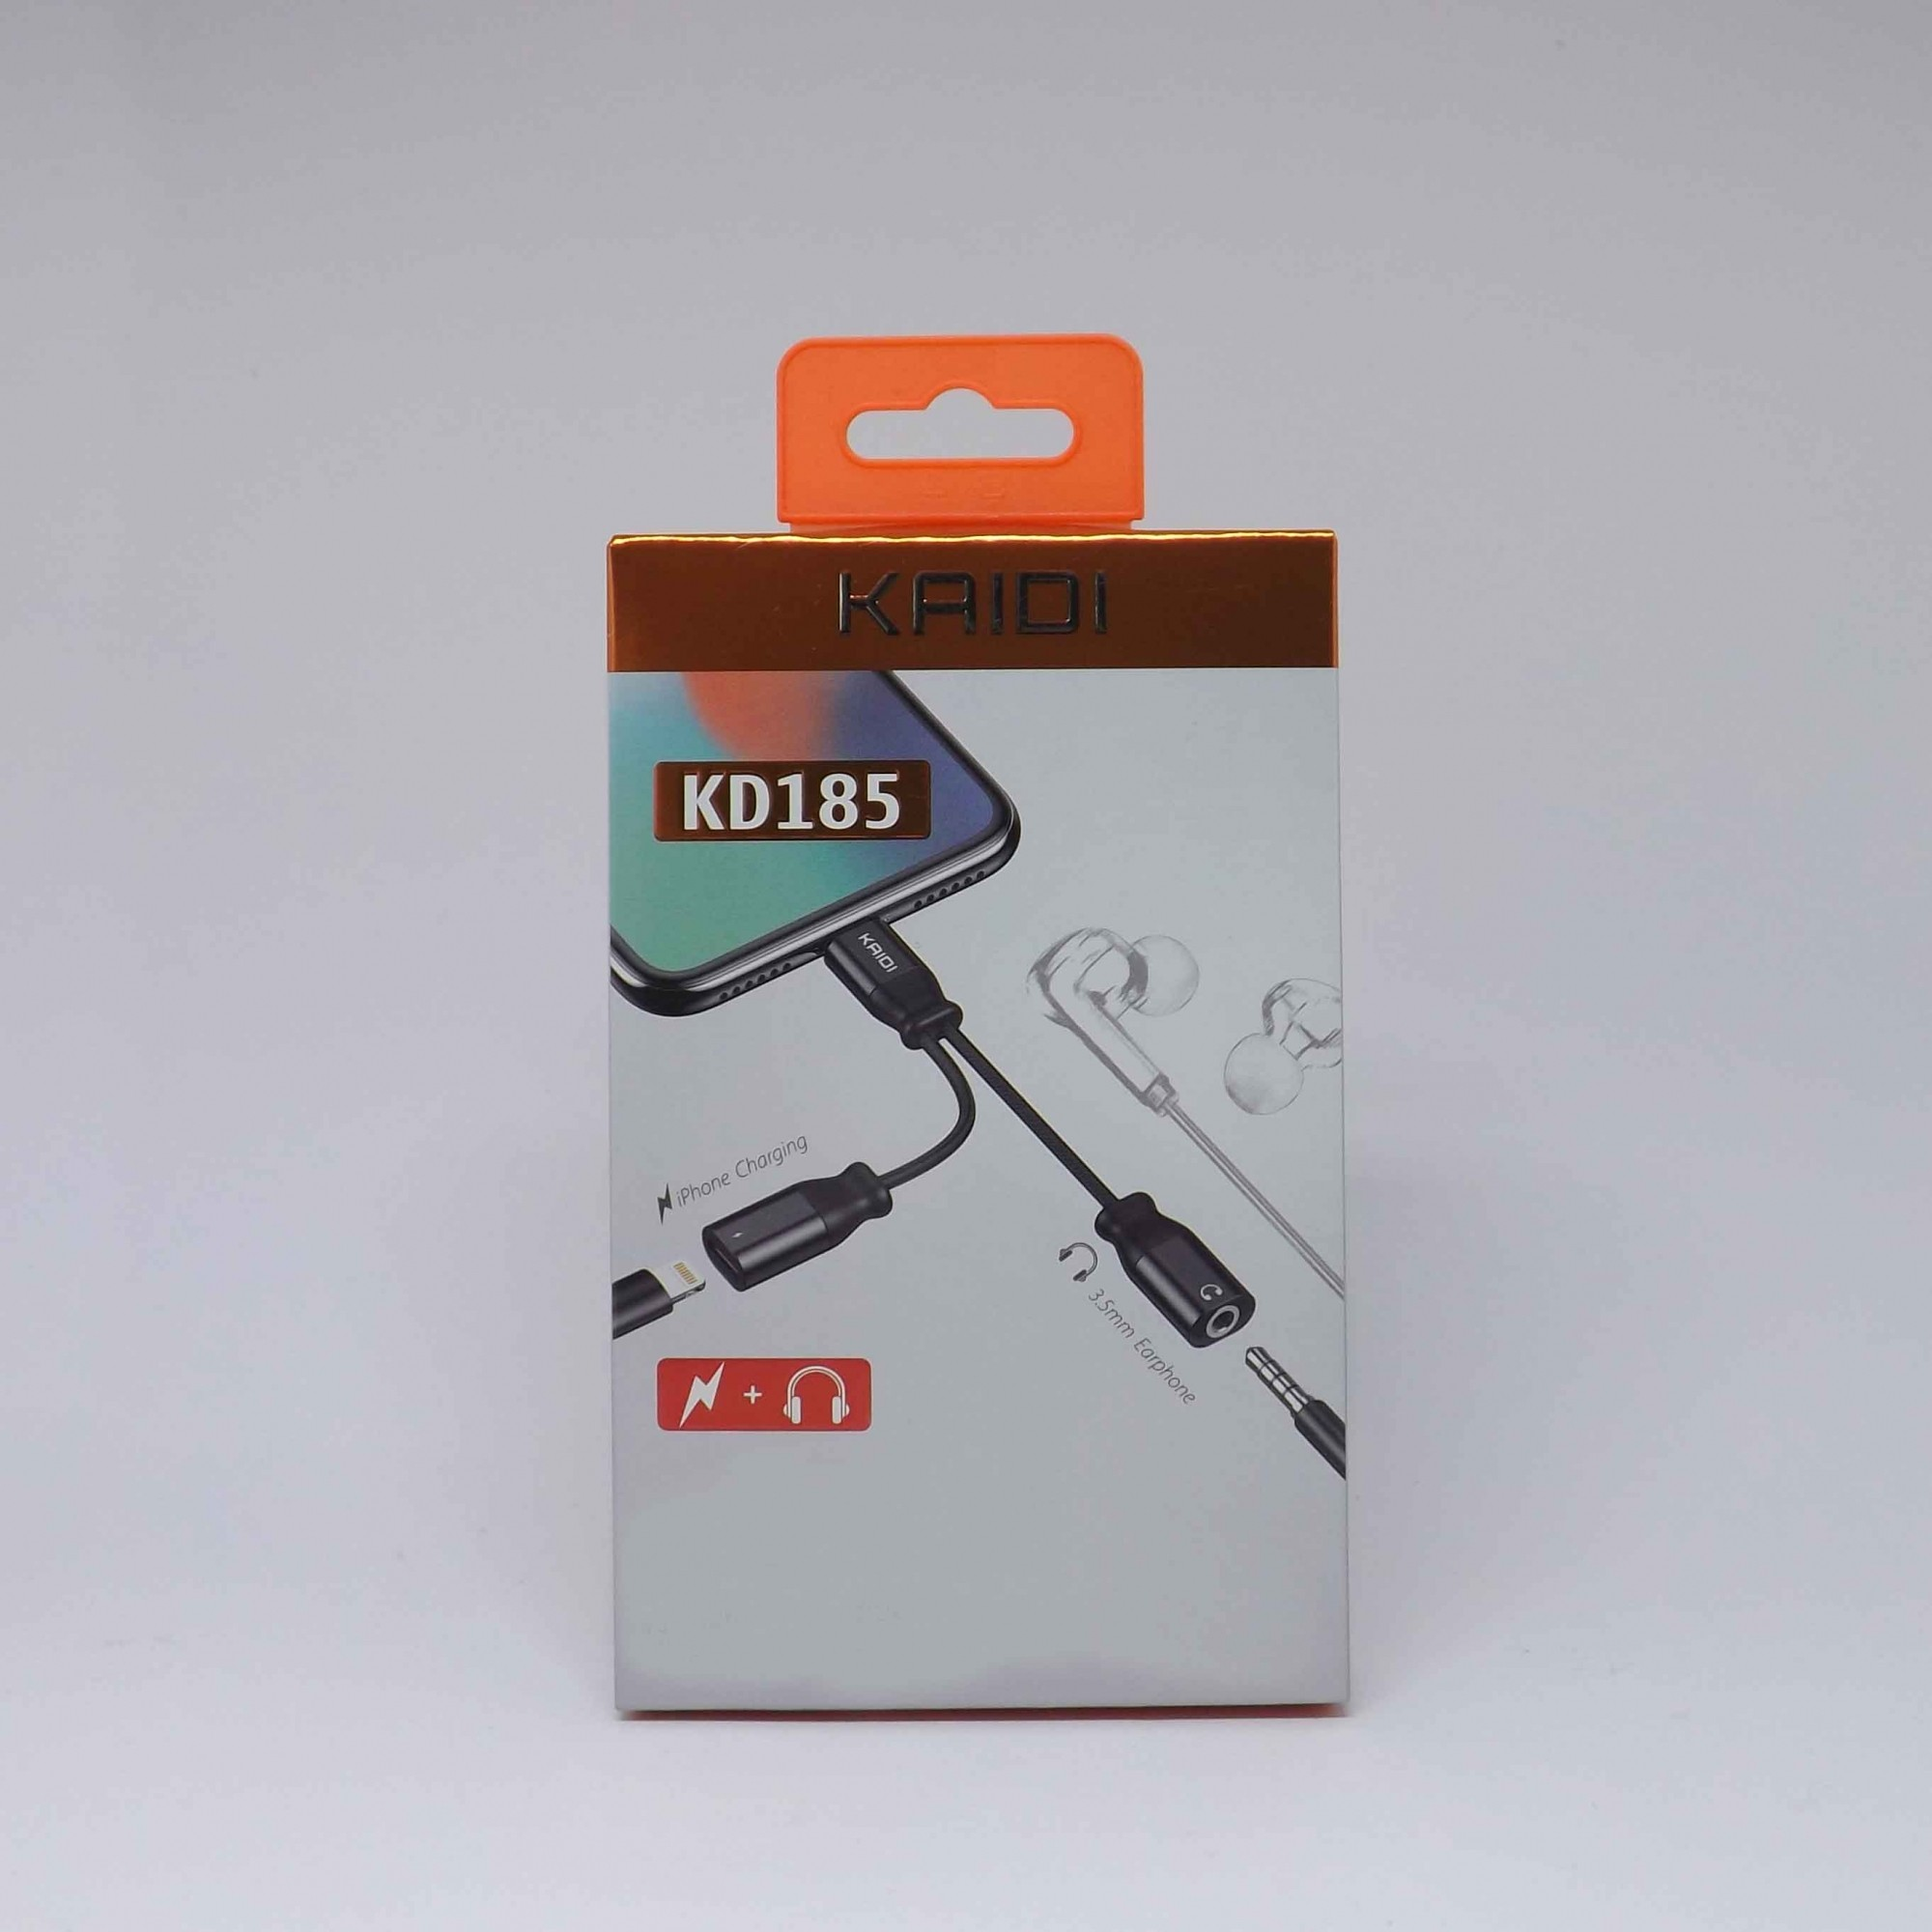 Adaptador iPhone Fone P2 e Carregadpr Kd185 - Kaidi